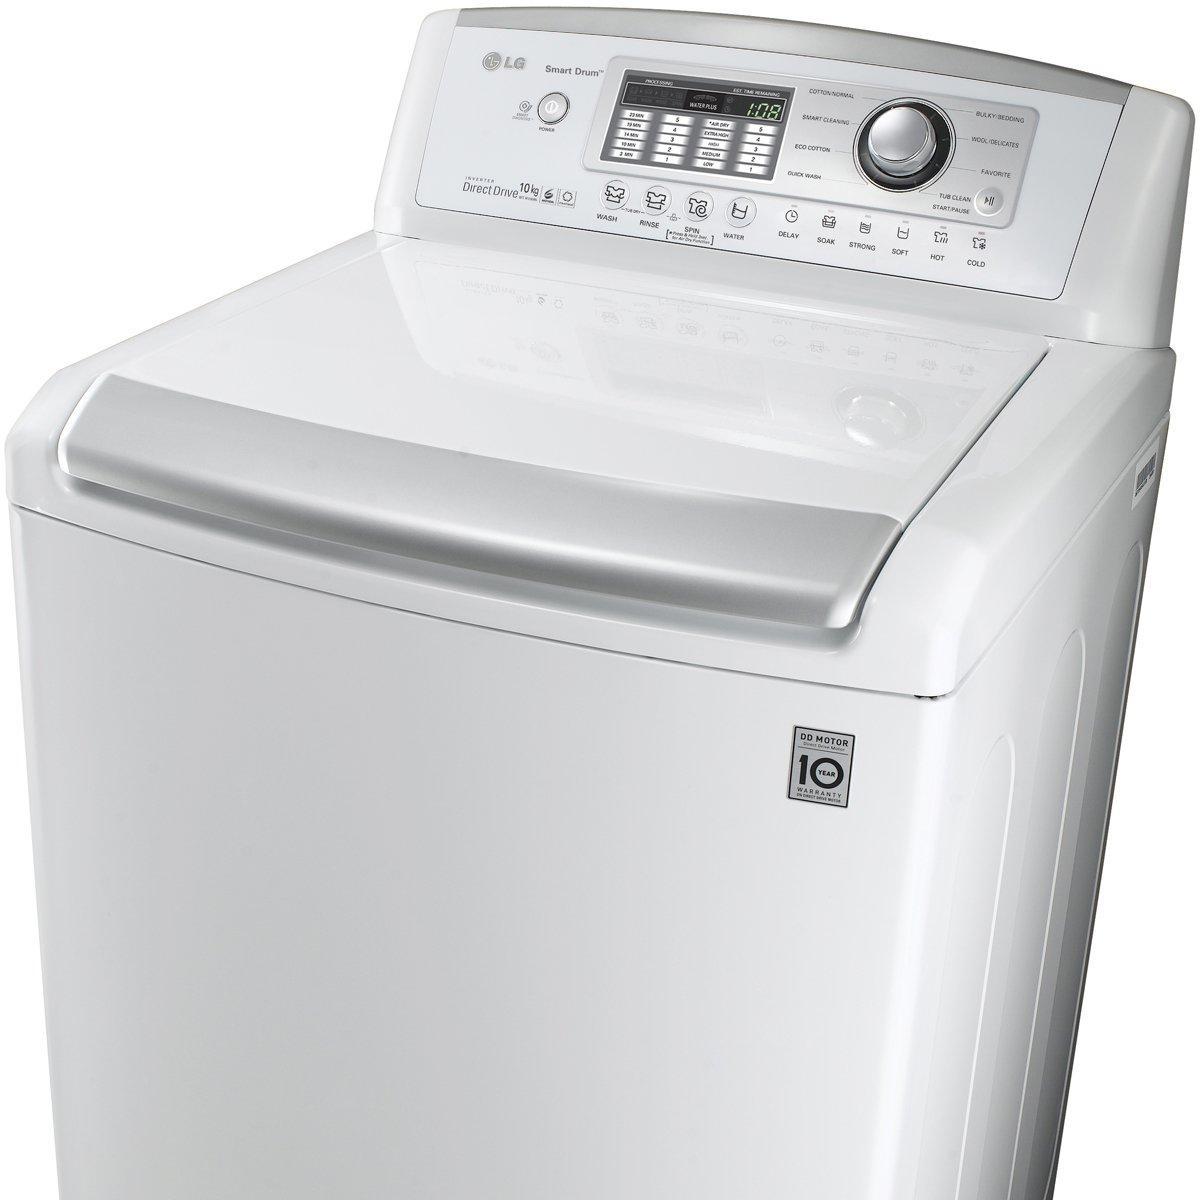 NEW LG WTR10686 10kg Top Load Washing Machine